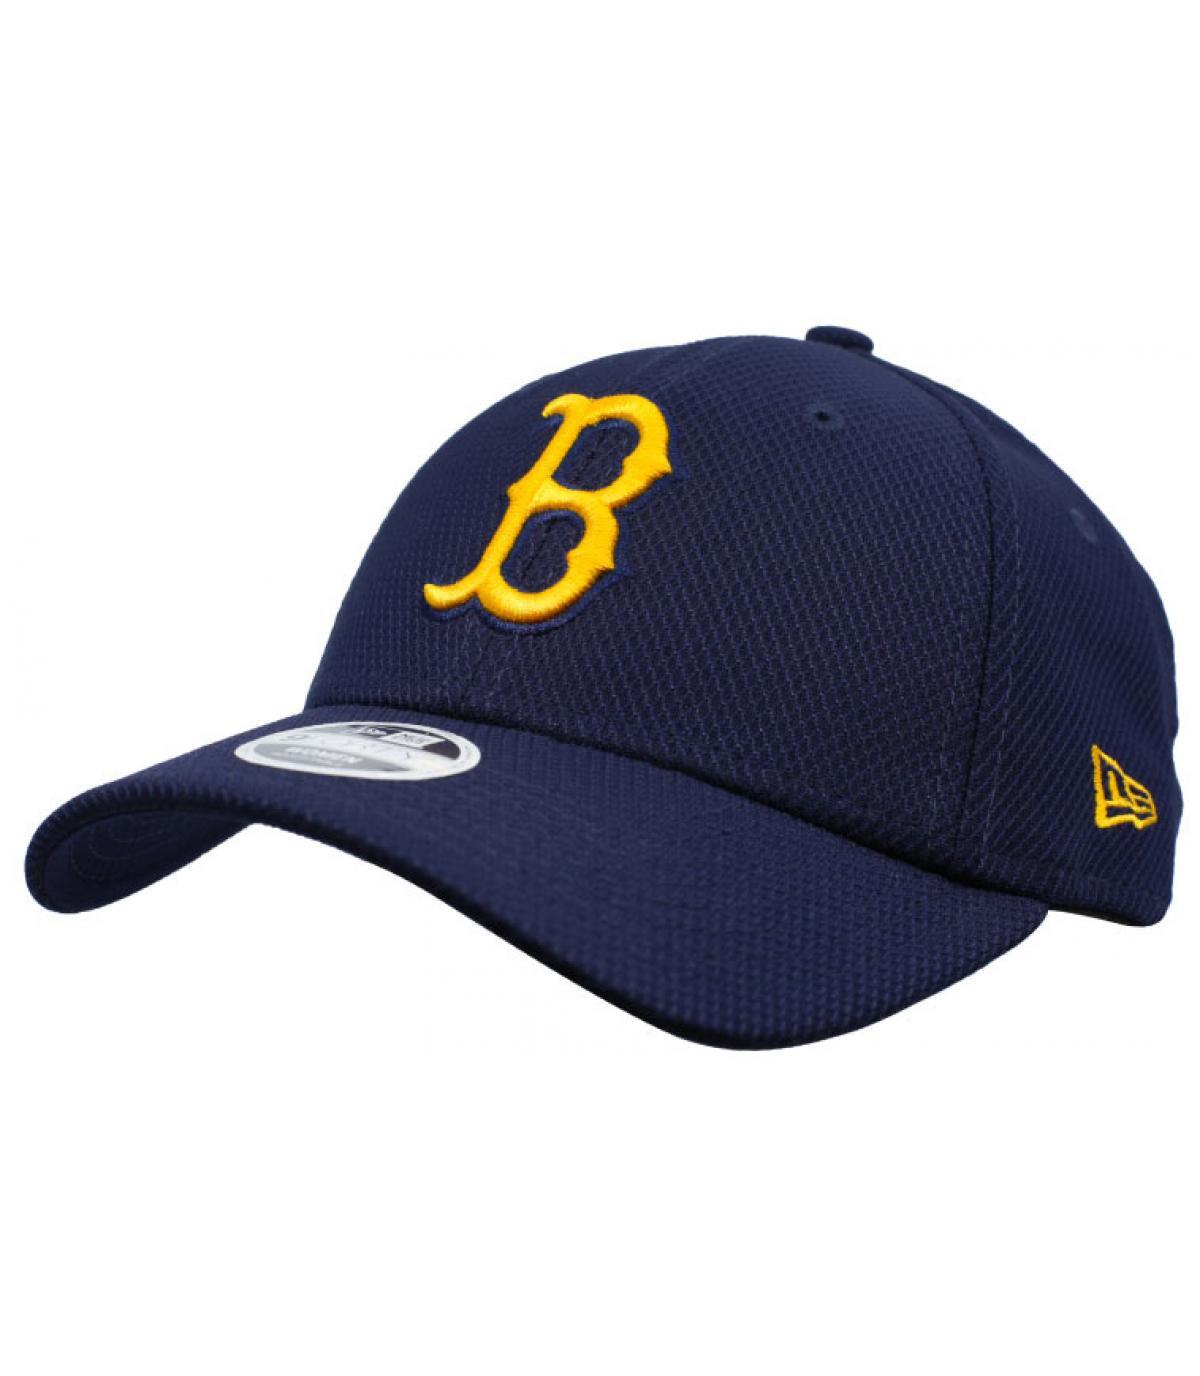 Damen Cap B blau gelb